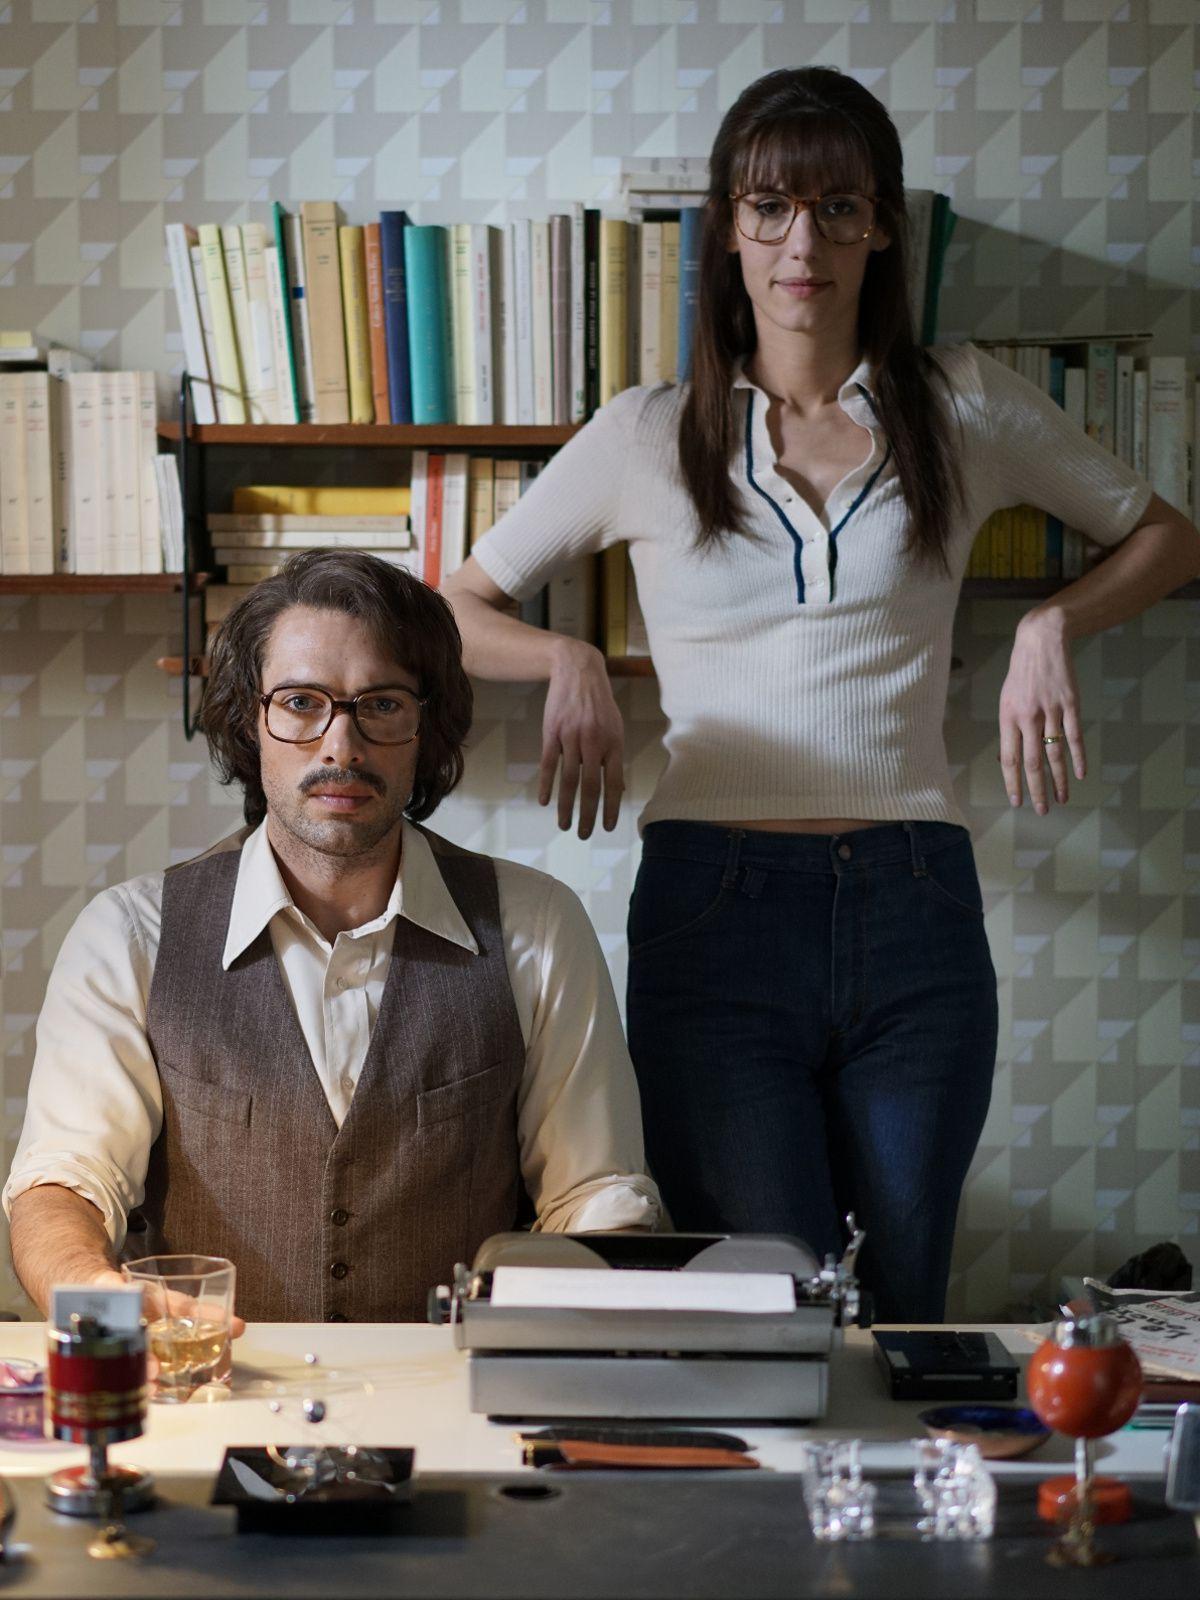 Monsieur &amp&#x3B; Madame ADELMAN (BANDE ANNONCE) Film de Nicolas Bedos avec Doria Tillier et Nicolas Bedos - Au cinéma le 8 mars 2017